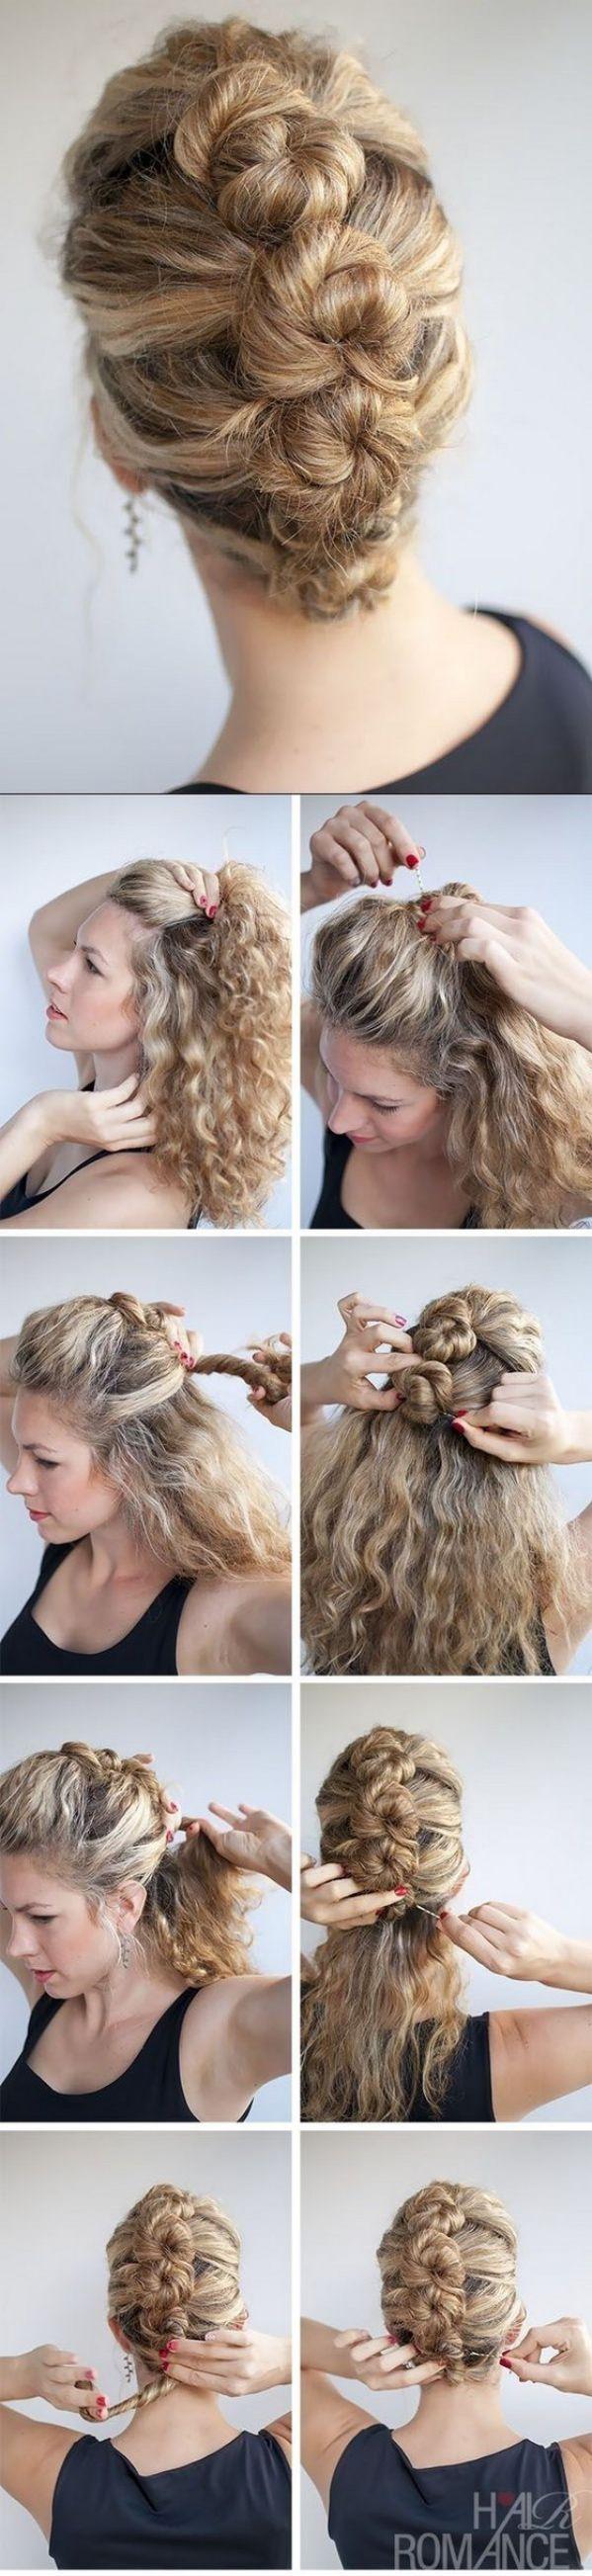 trenza recogida en cabello rizado